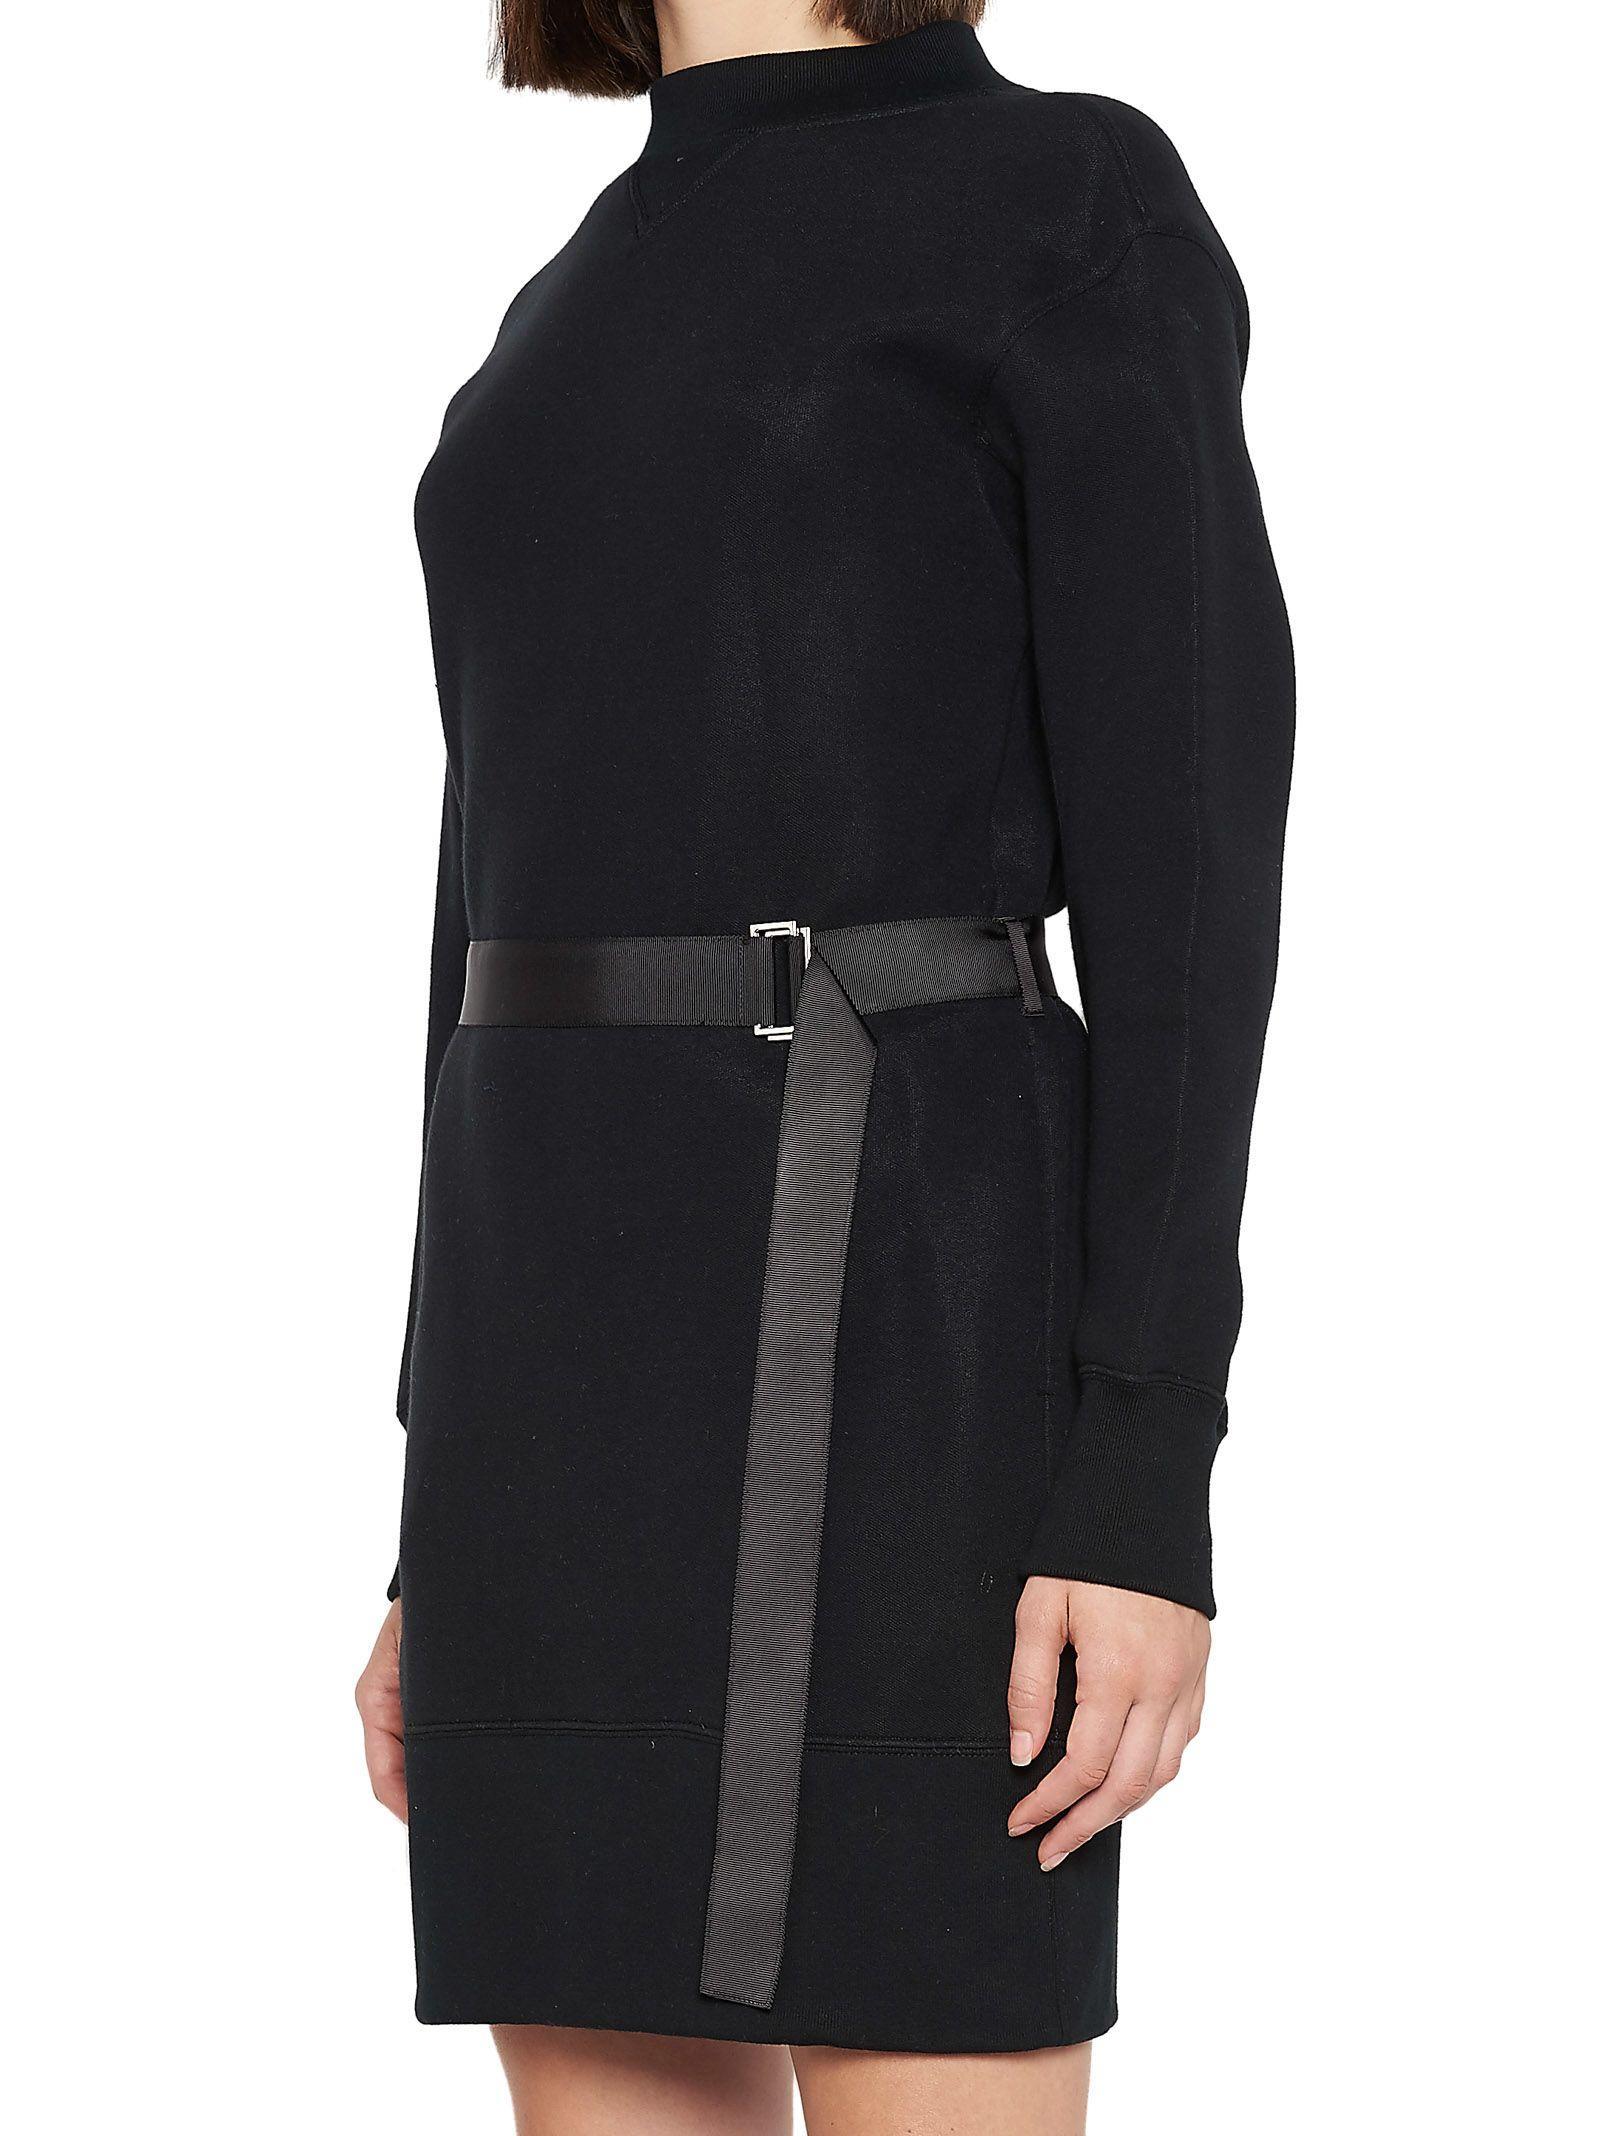 Sacai Black Cotton Dress